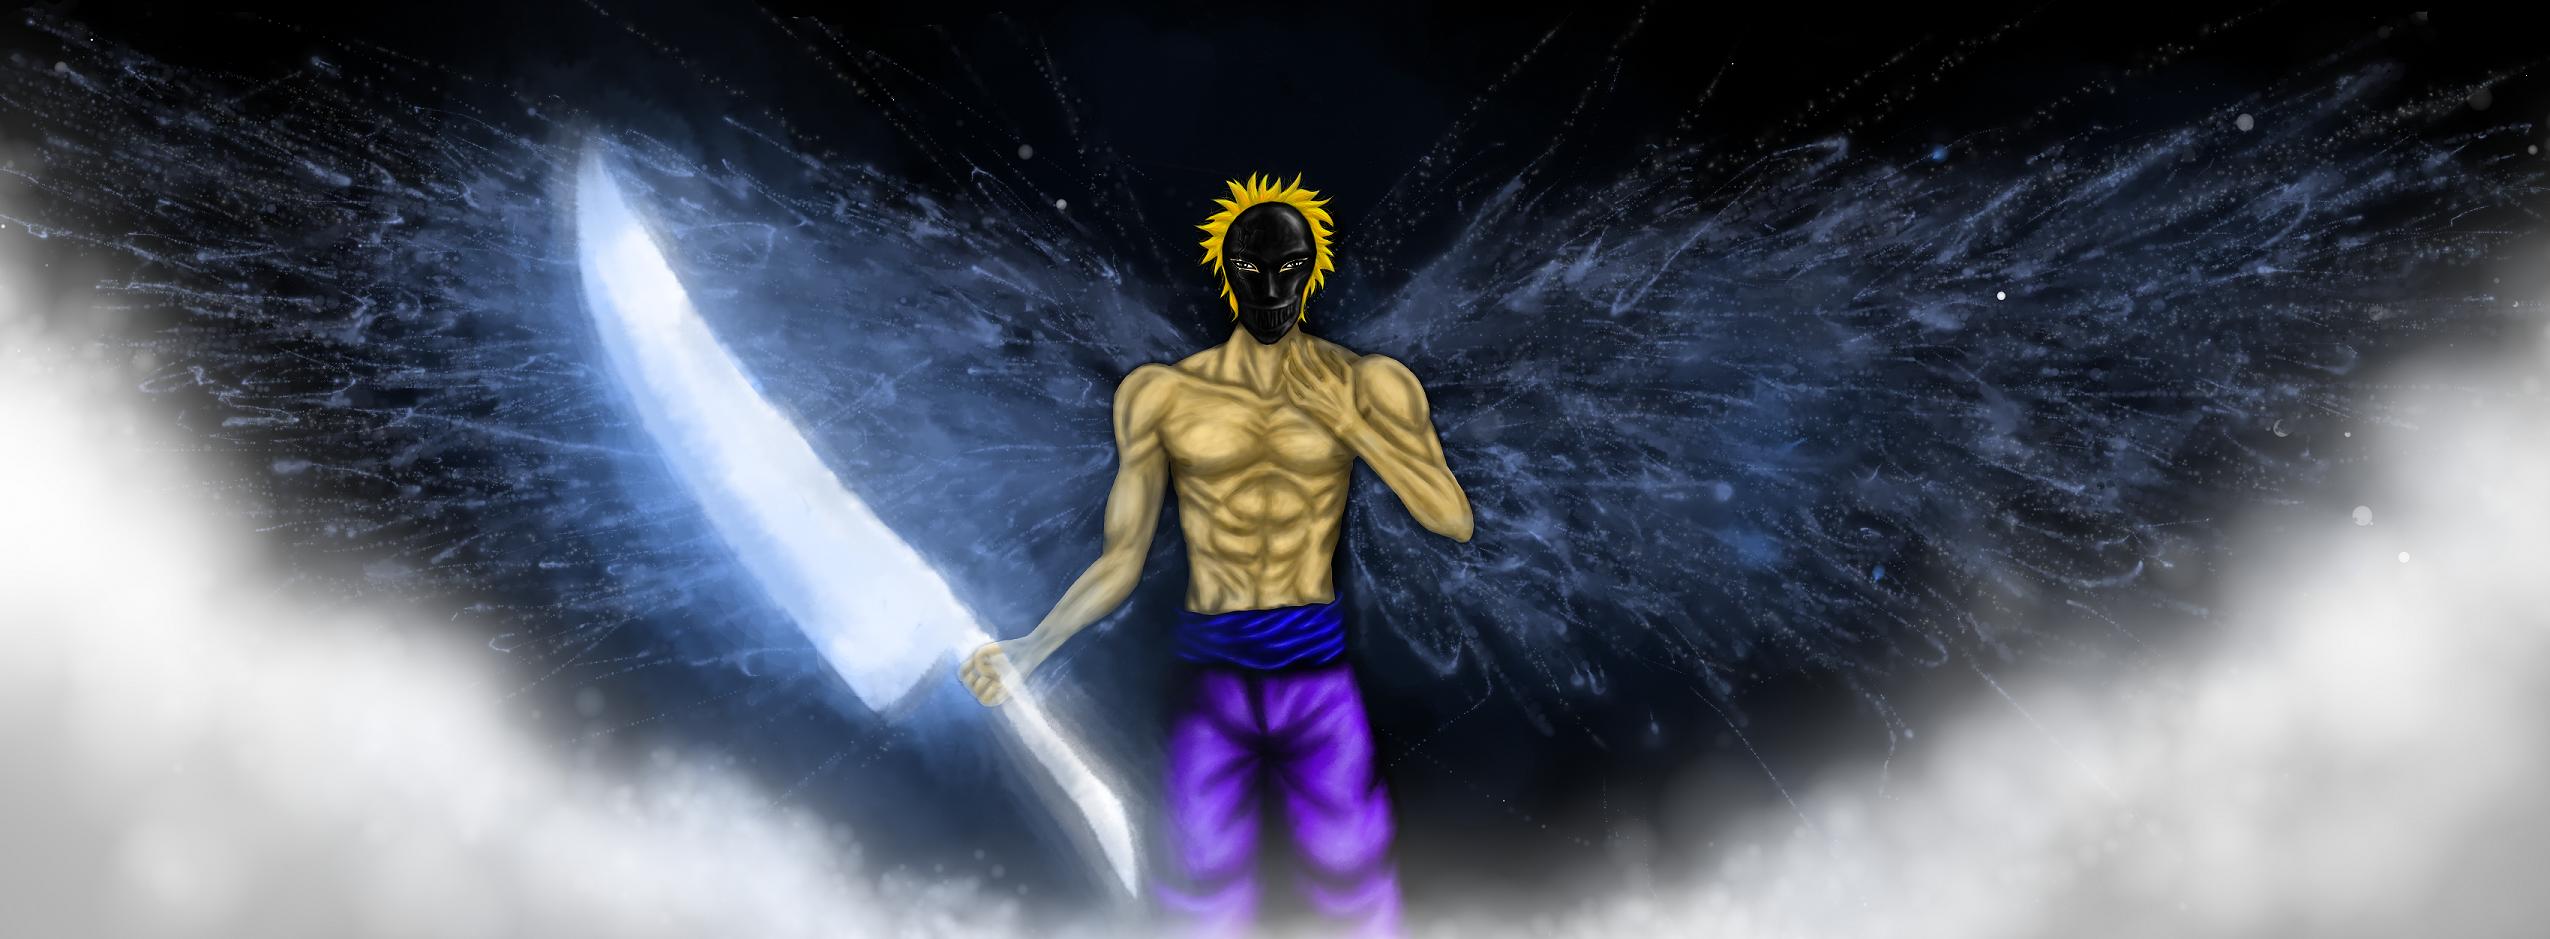 Masked Angel For Zibit by MusicAndArtItsMyLife